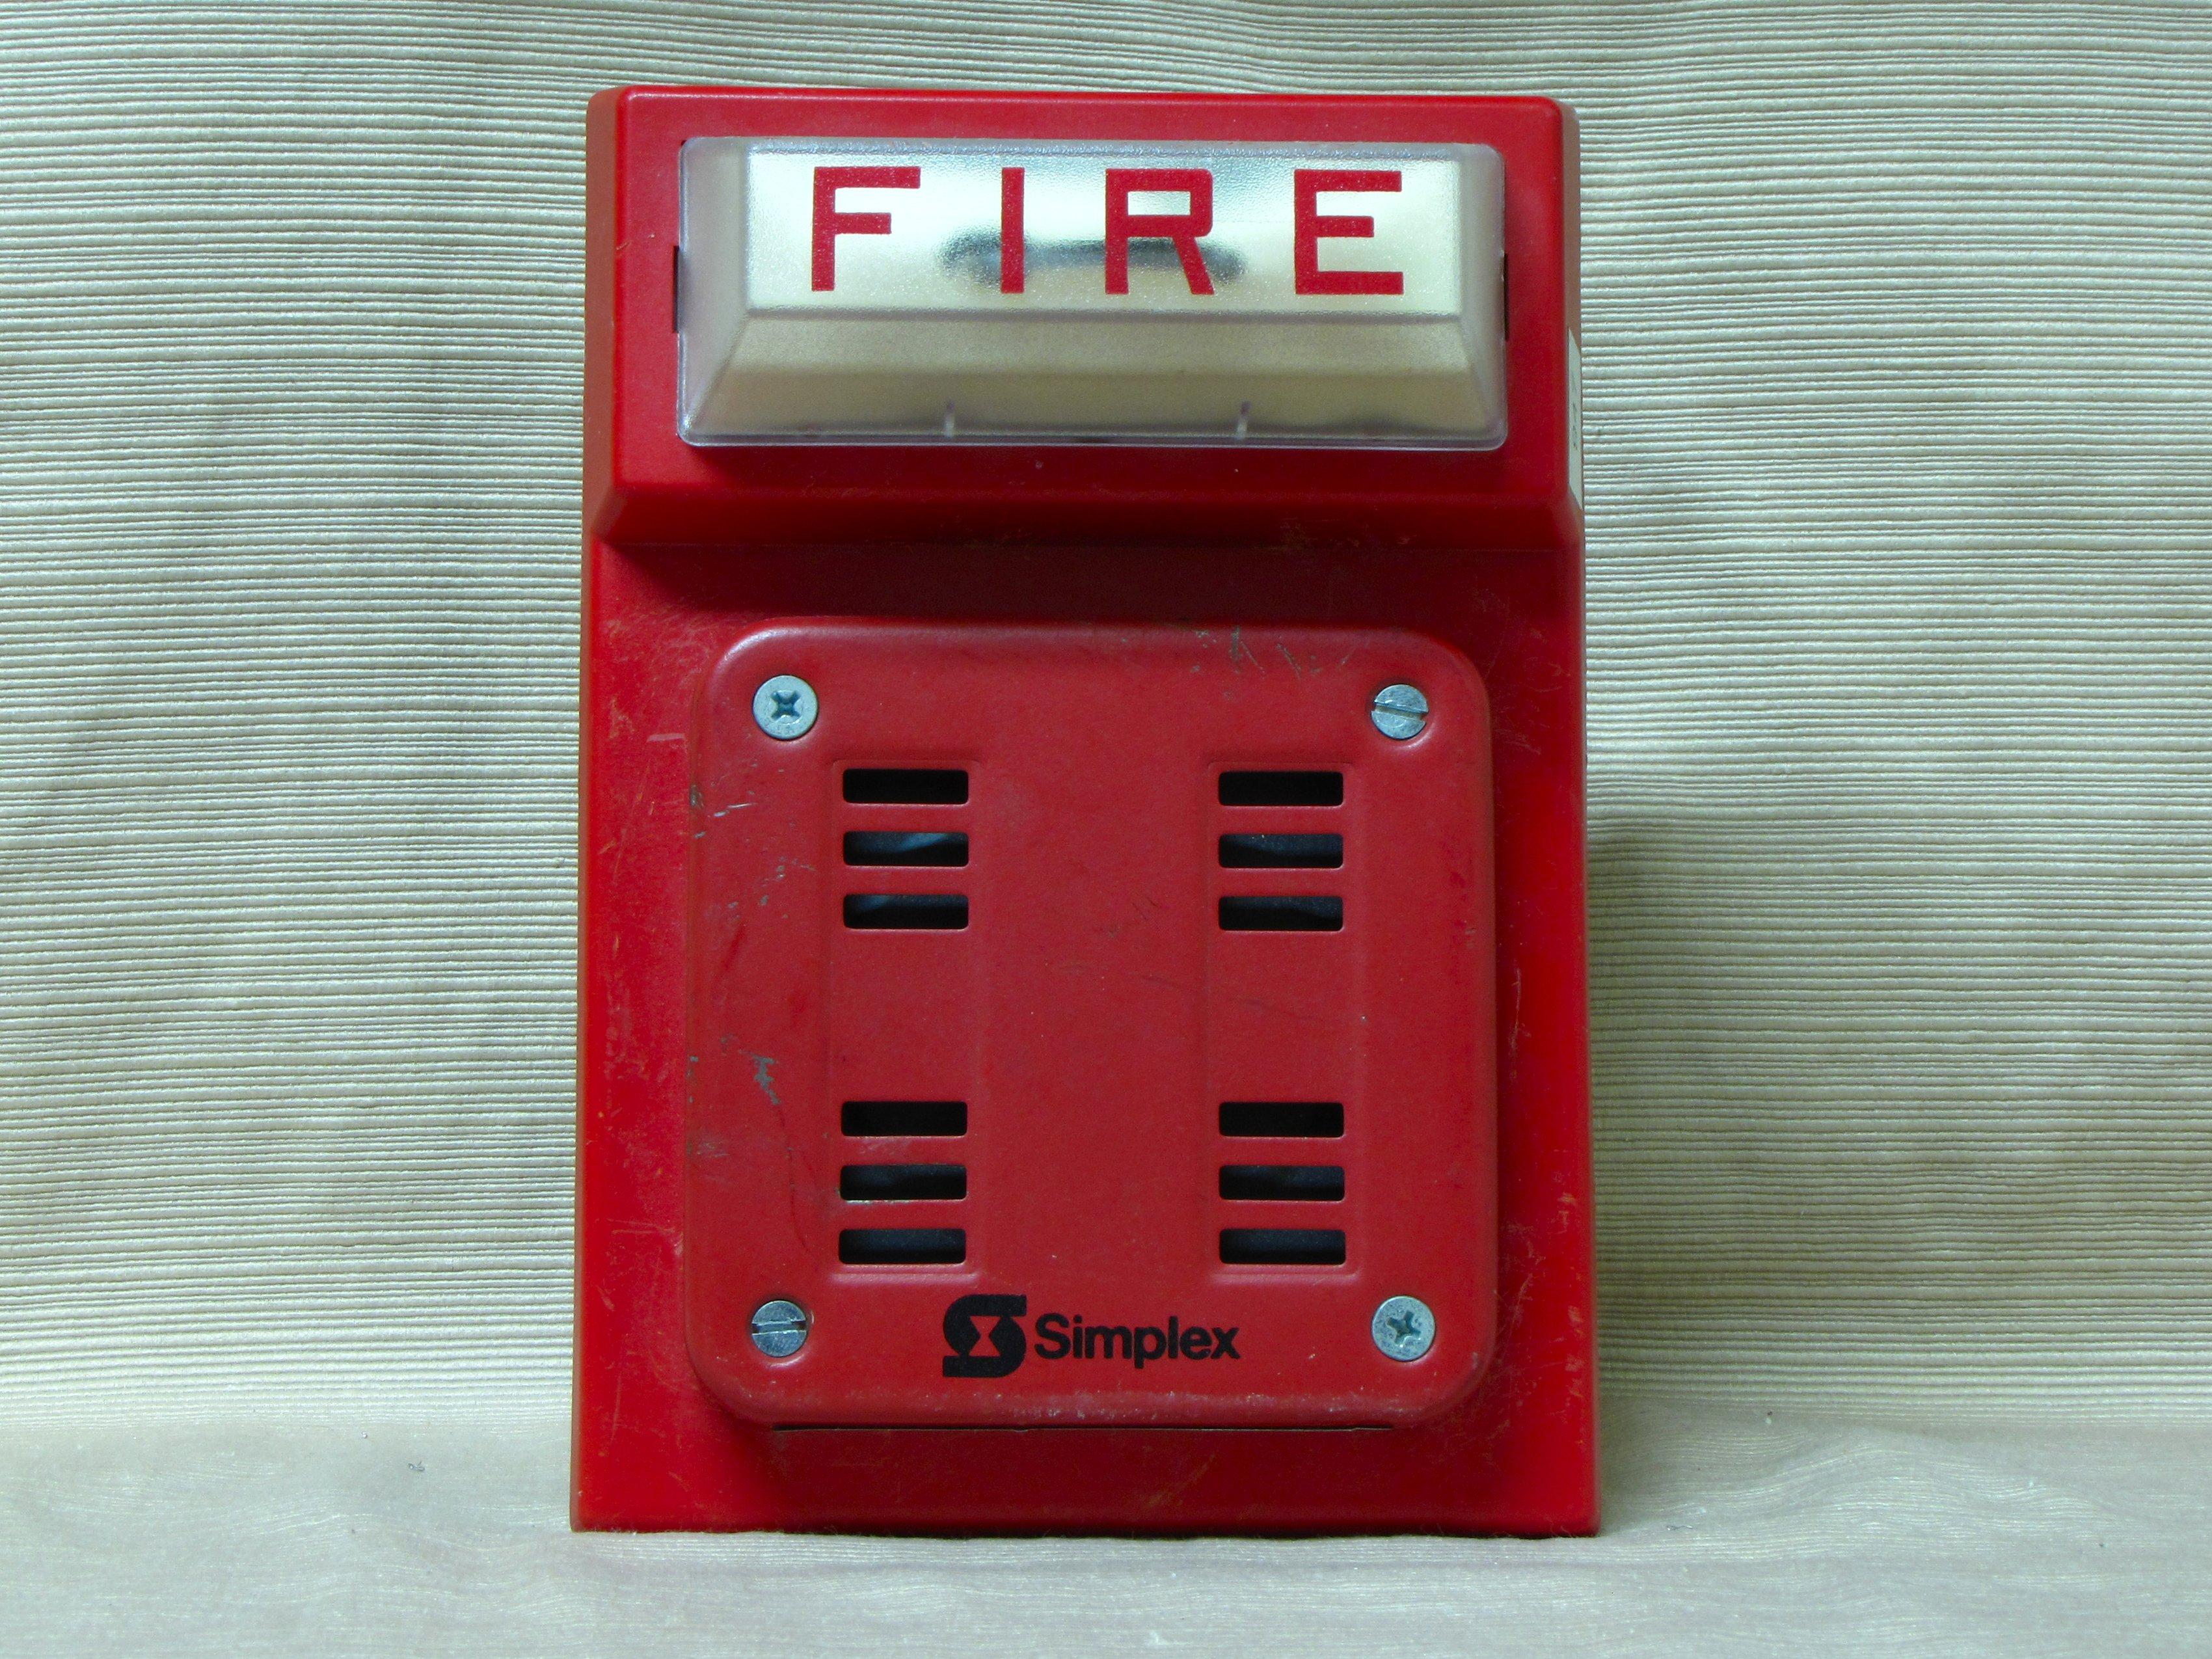 Wheelock Fire Alarm as well Est Gcf S7vm furthermore C2ltcGxleCBmaXJlIGFsYXJtIGhvcm4 together with Simplex 2098 9642 moreover Simplex 2901 9838. on simplex fire alarm horn strobe